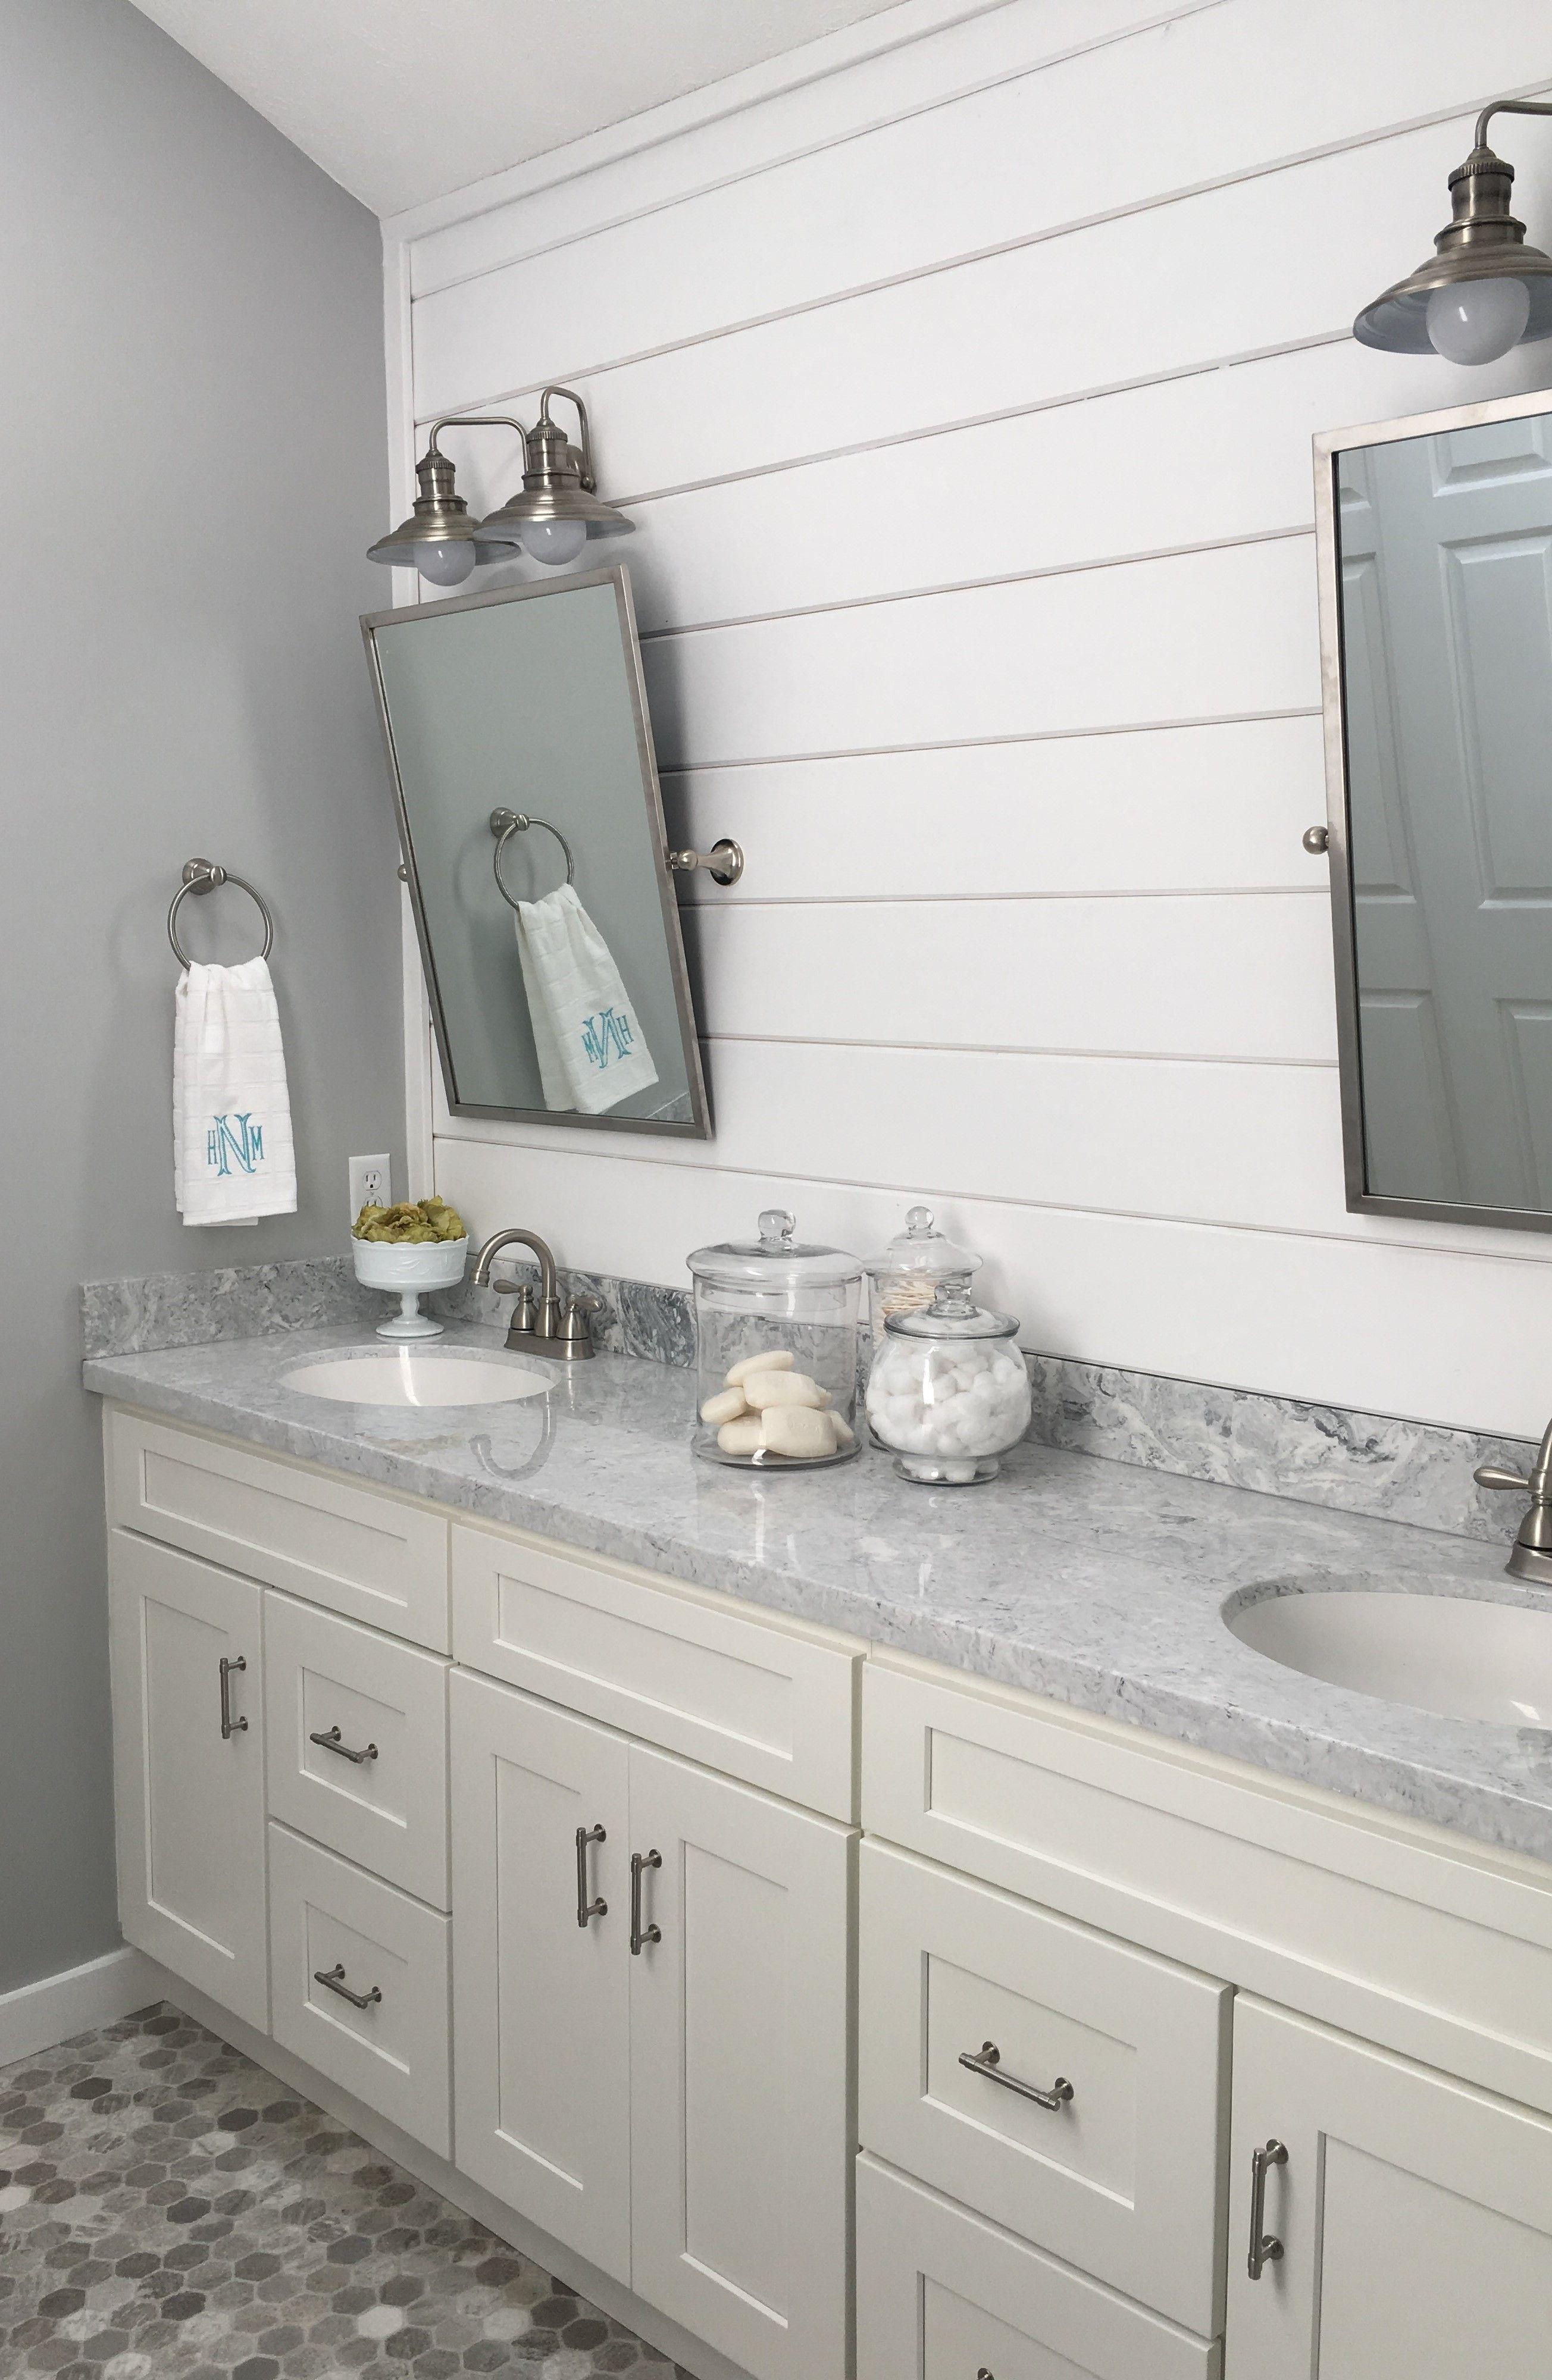 Budget Bathroom Remodel Style master bathroom remodel on a budget   dream bathrooms, farmhouse